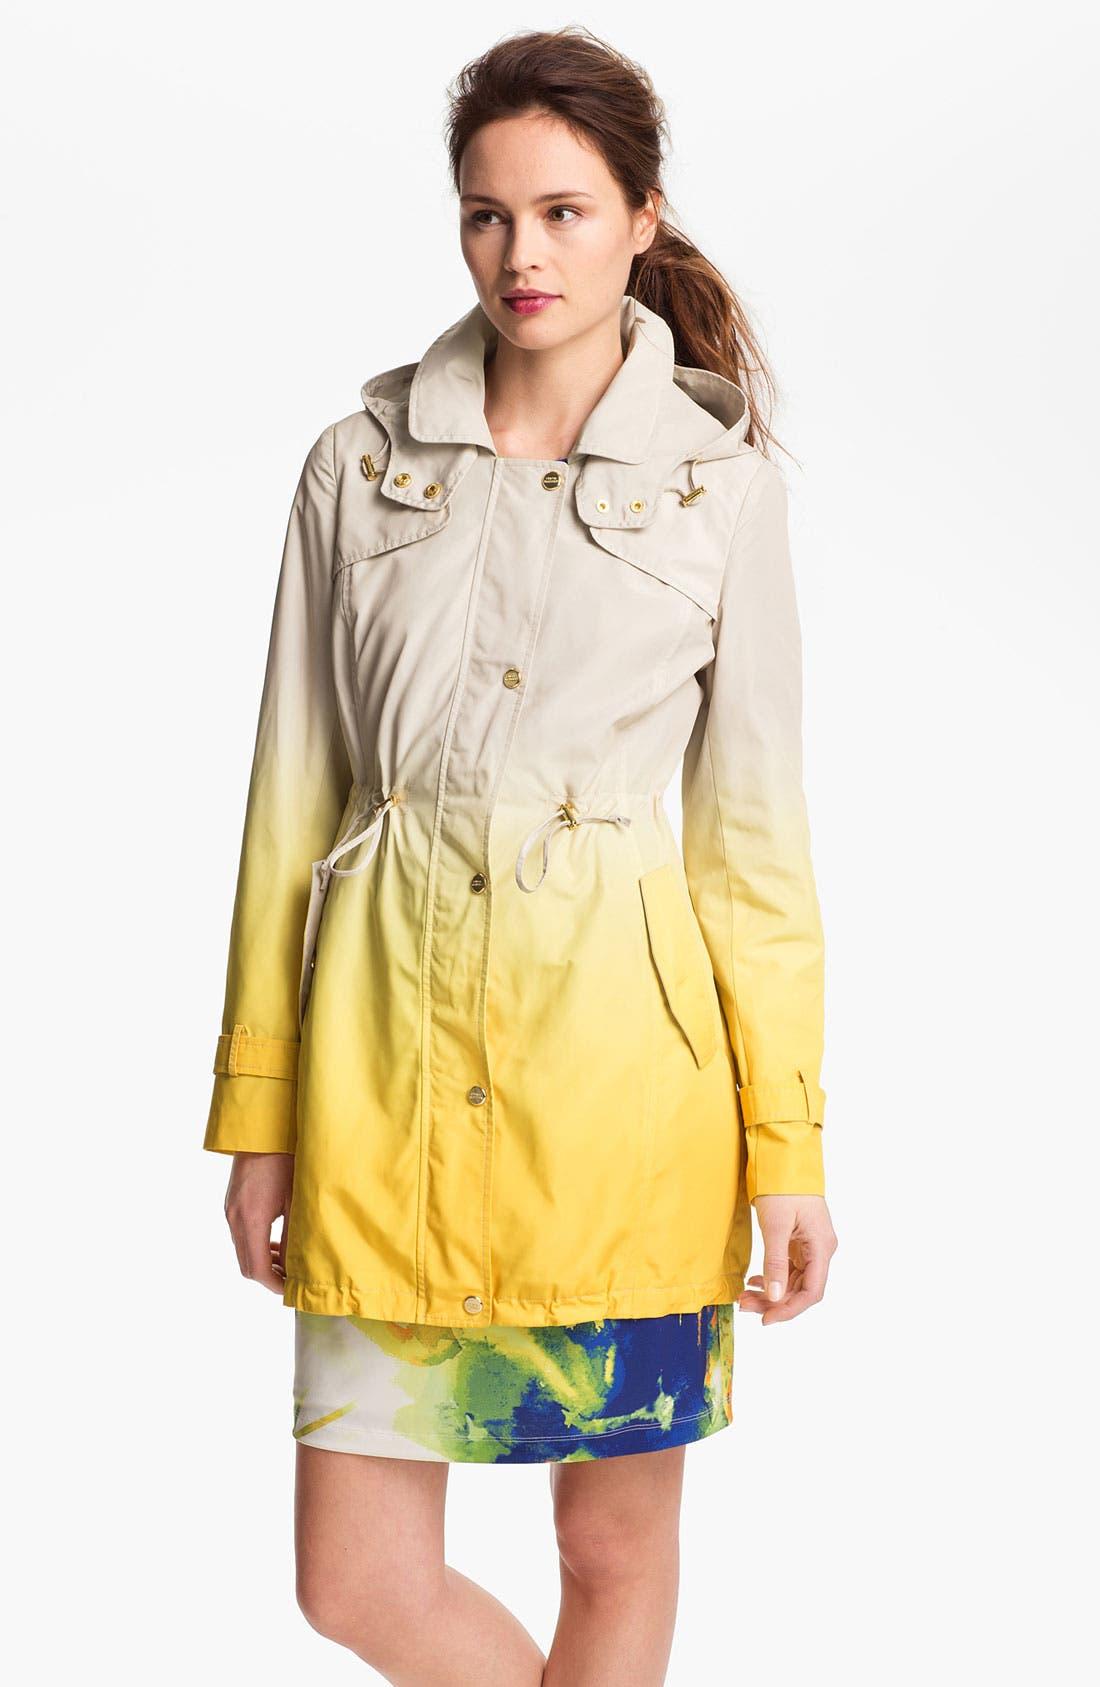 Alternate Image 1 Selected - Steve Madden Ombré Coat with Detachable Hood